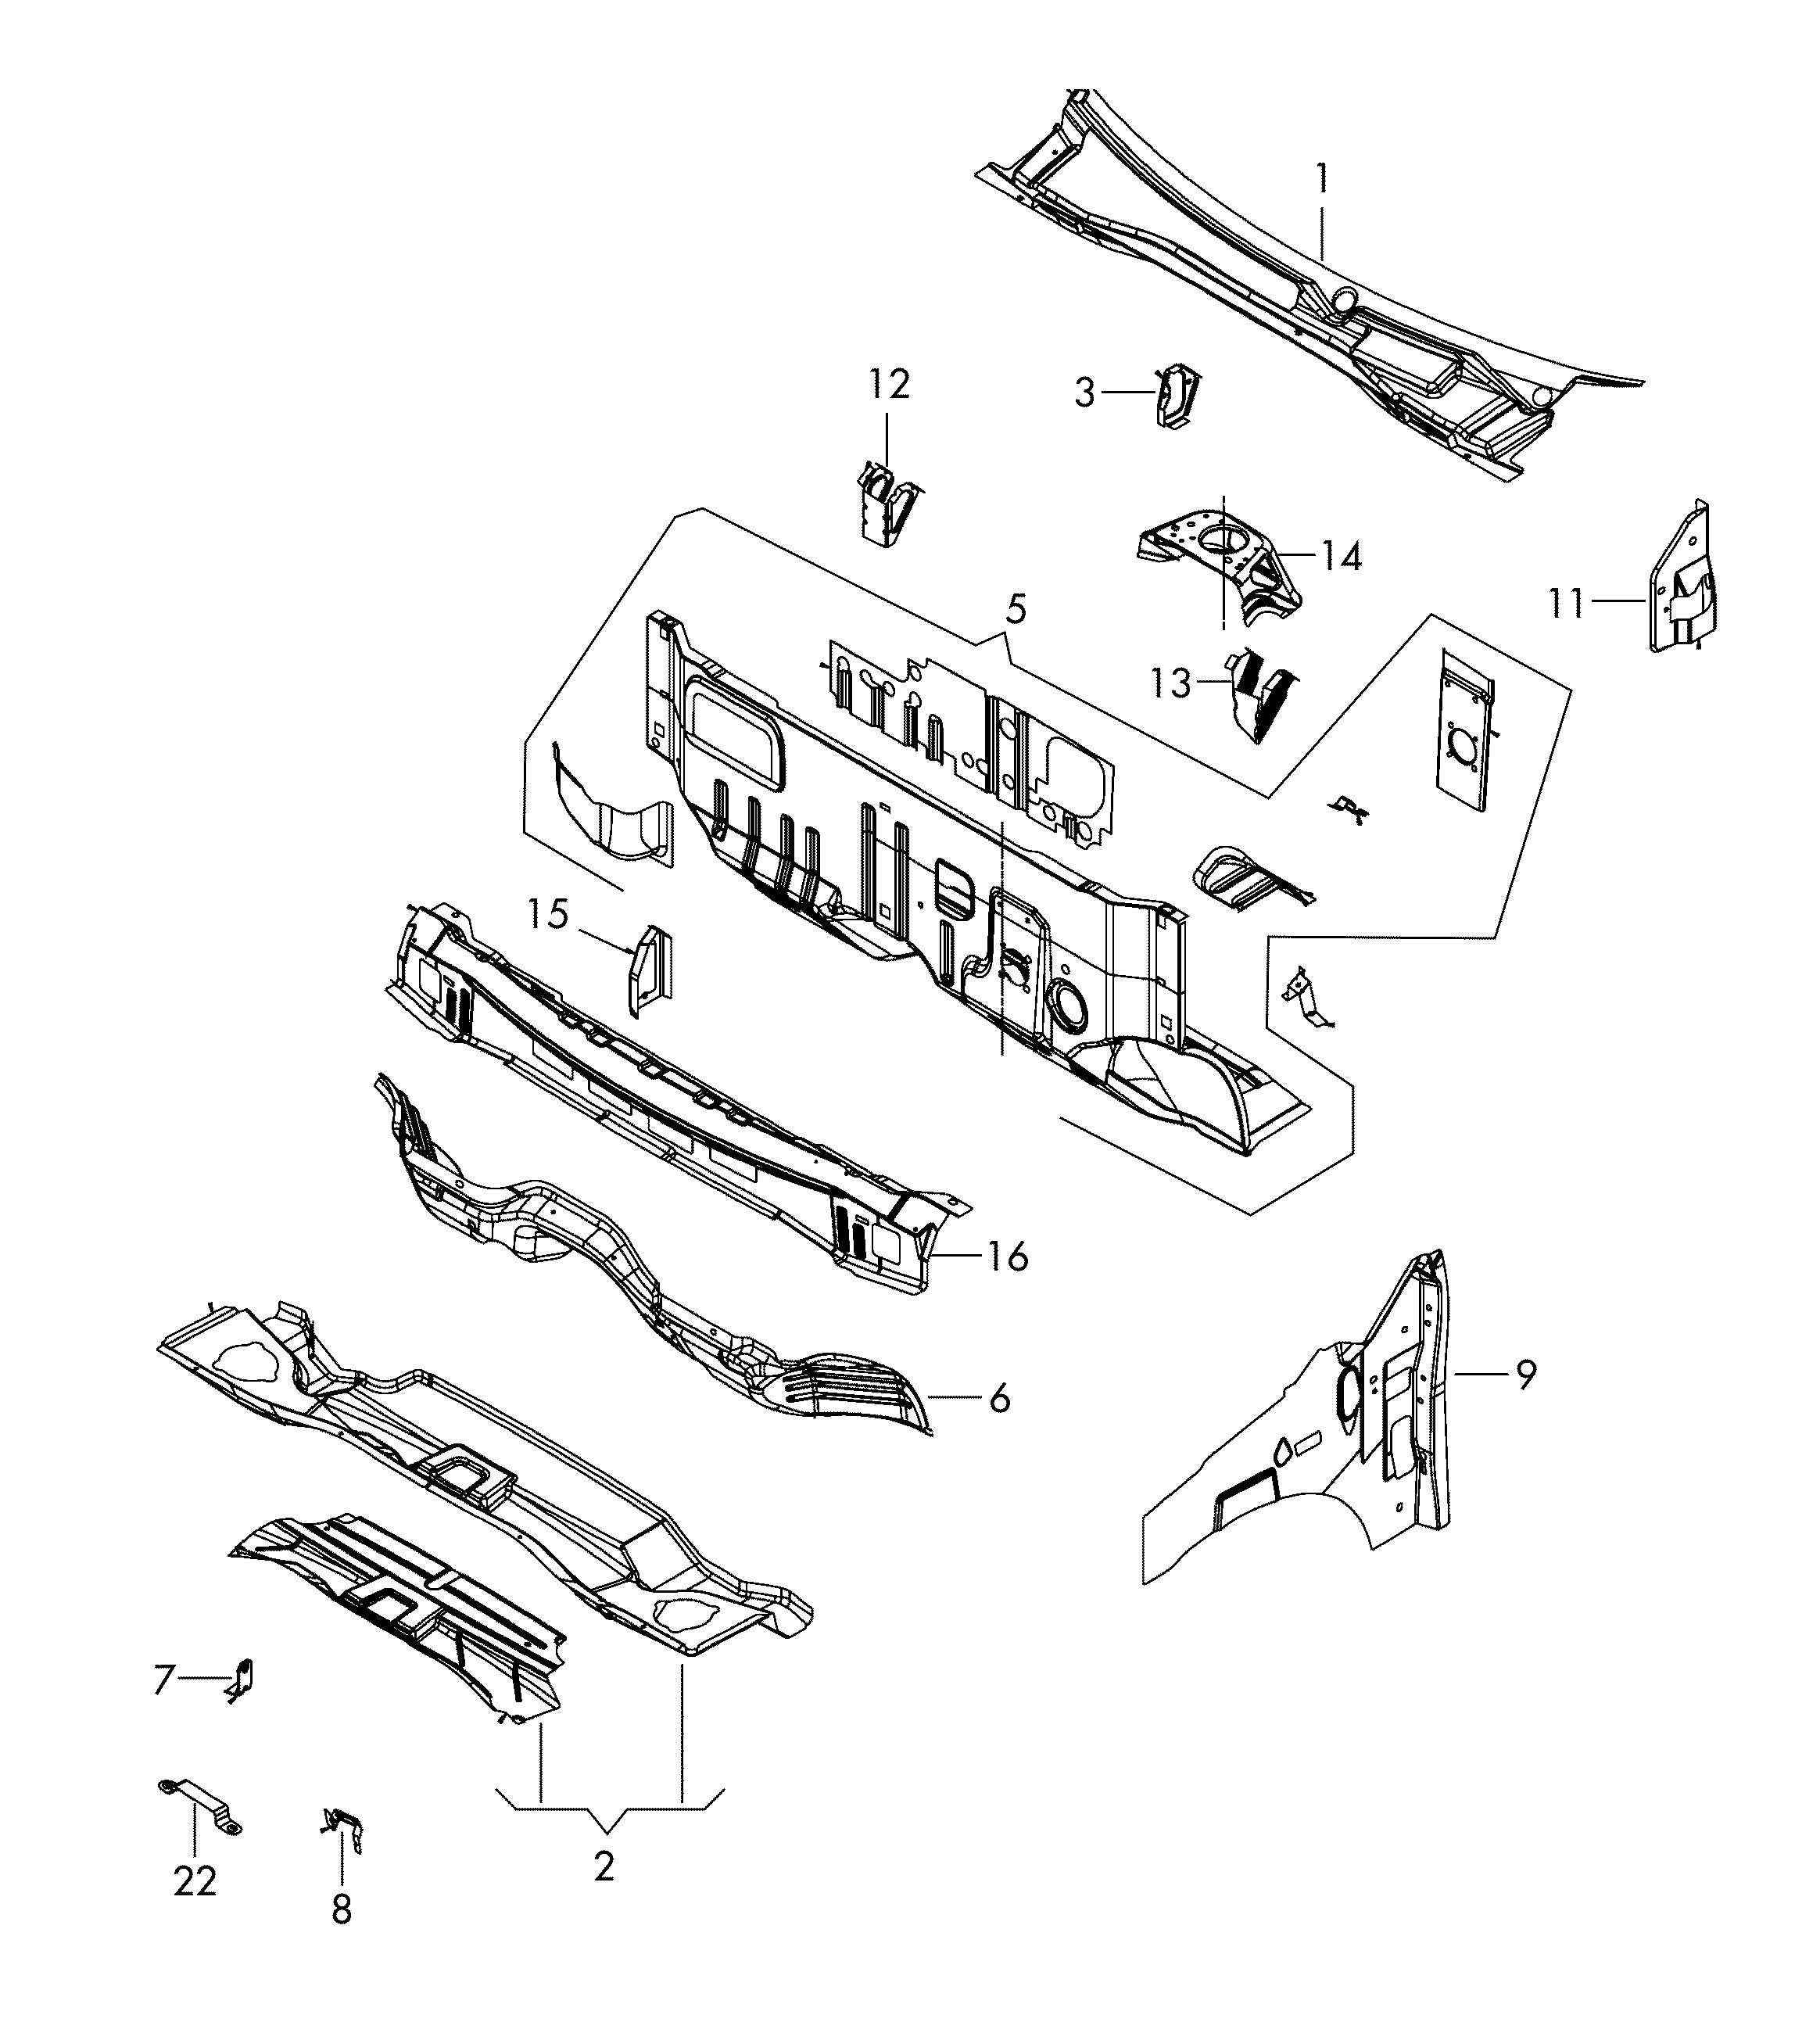 1969 Vw Ghia Wiring Diagram. Diagram. Auto Wiring Diagram